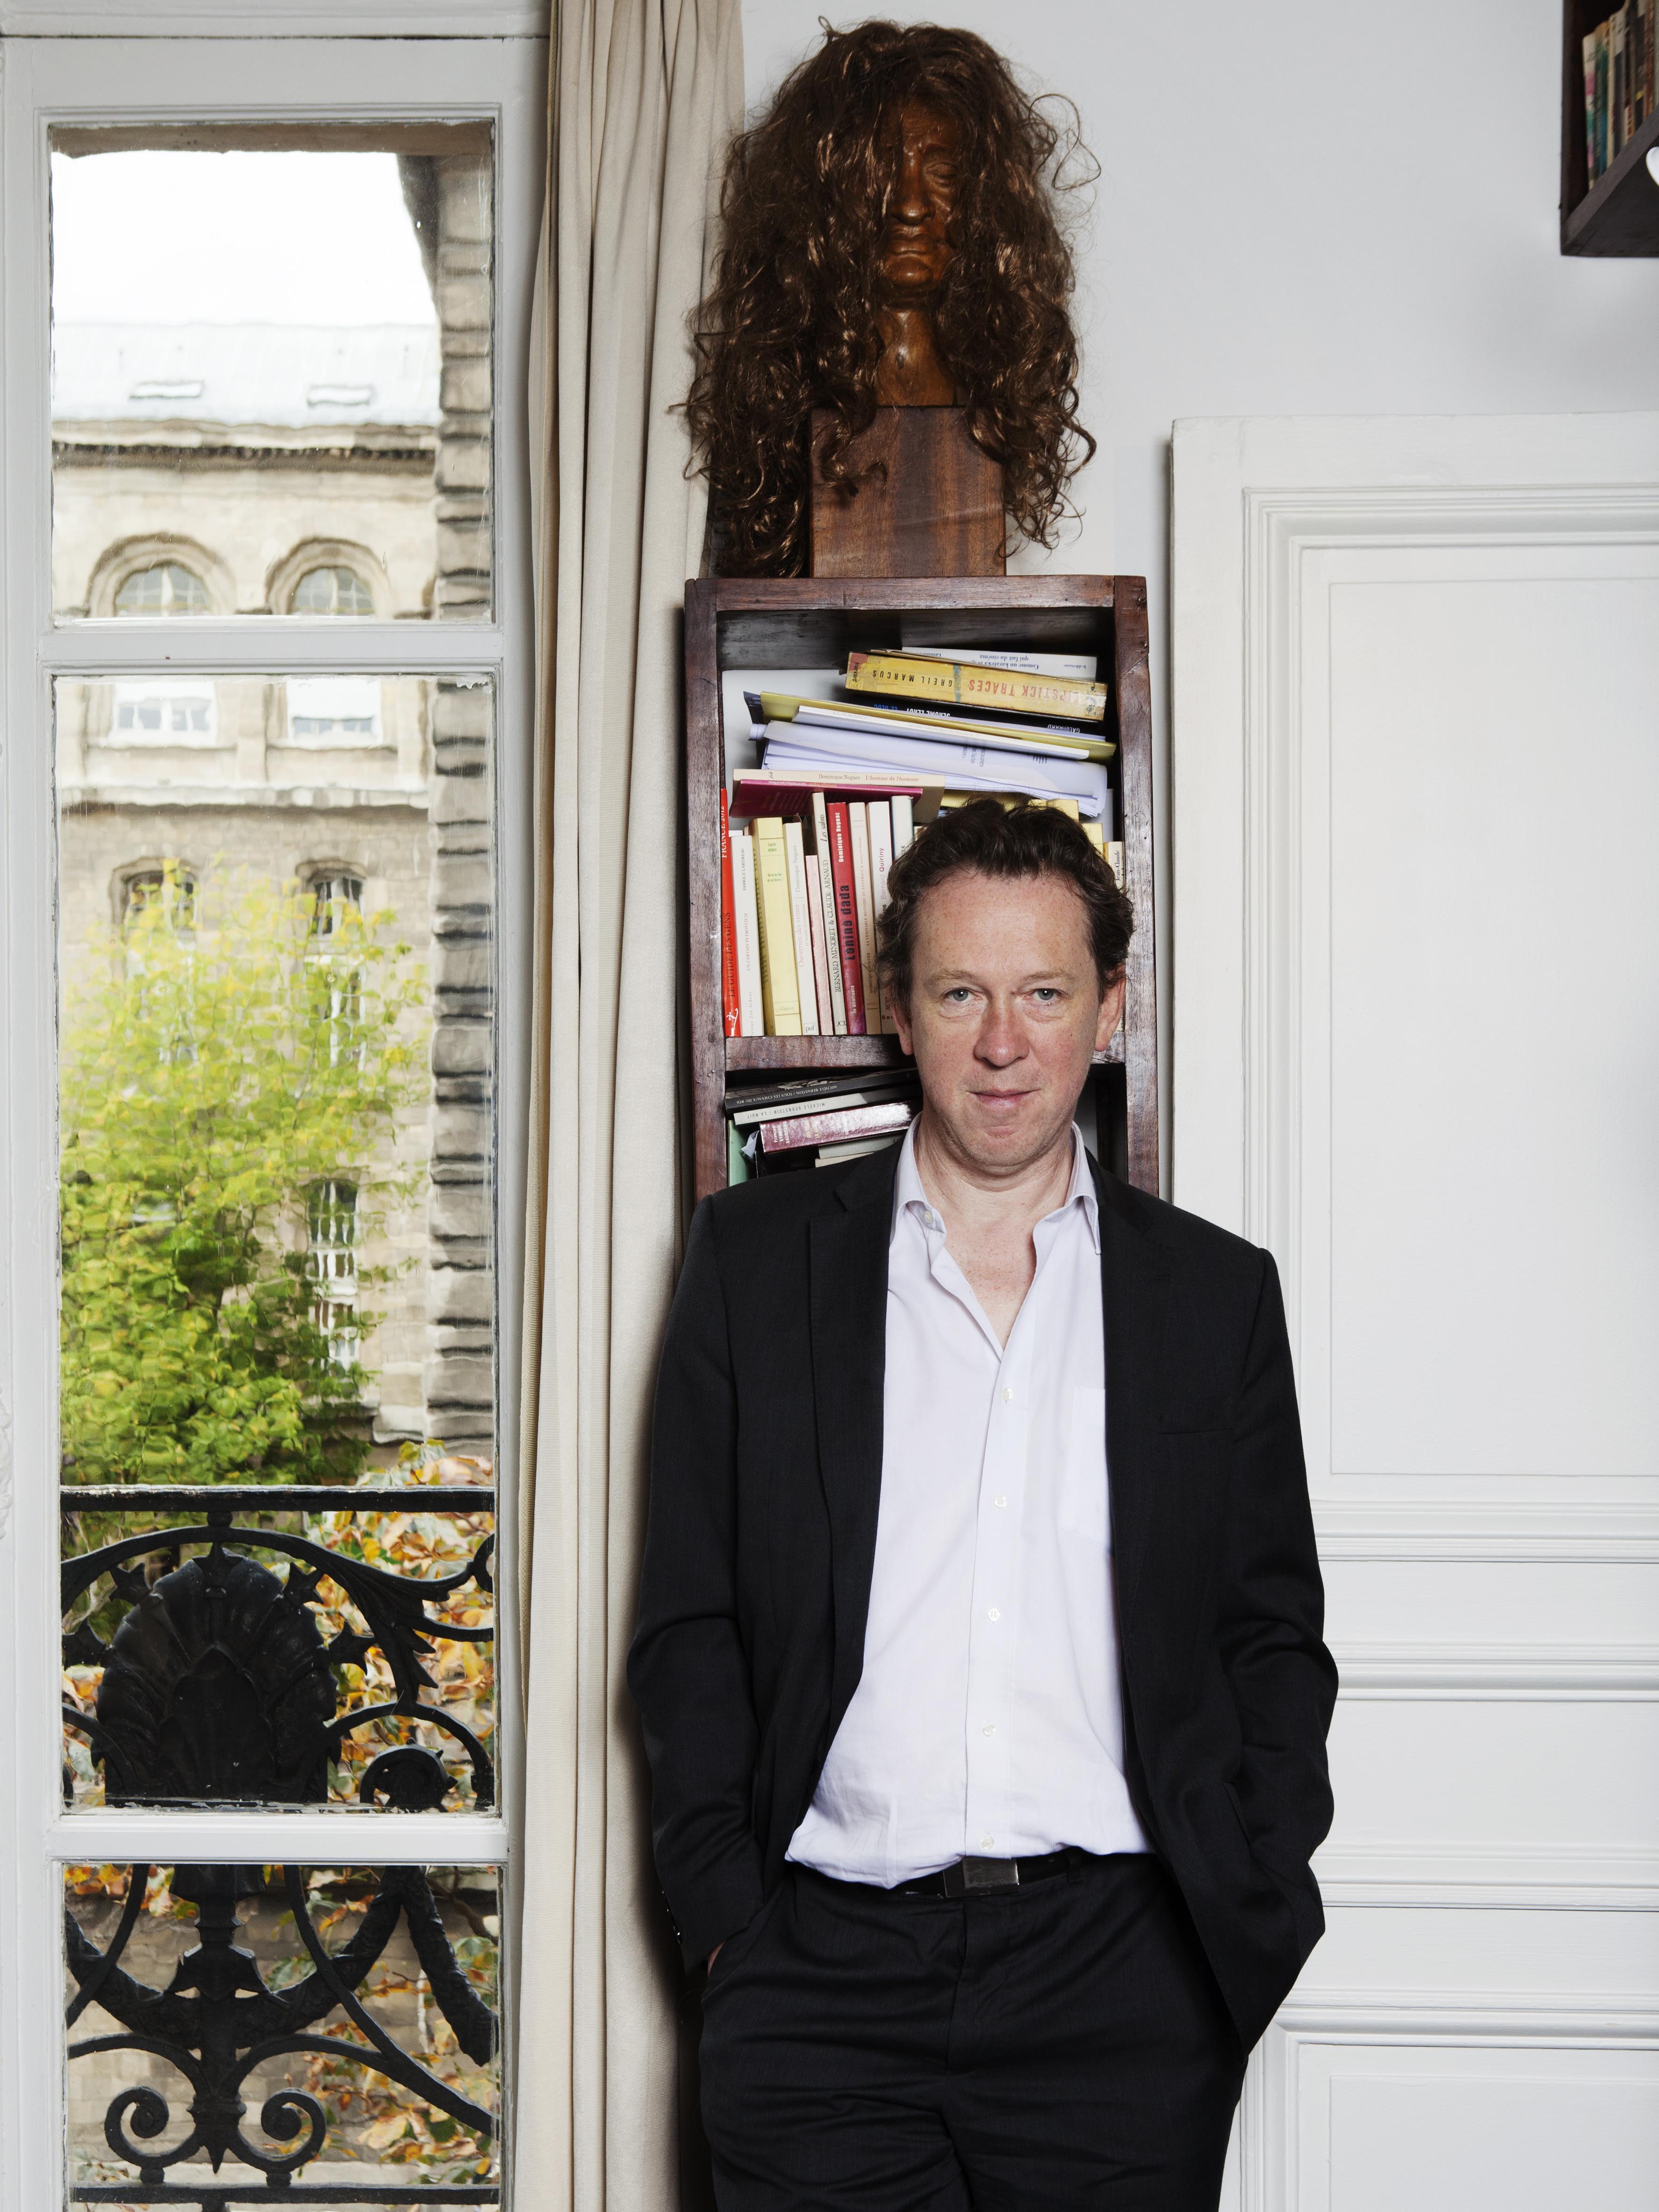 Benoît Duteurtre 2014 © Patrice Normand / Bruit de Lire